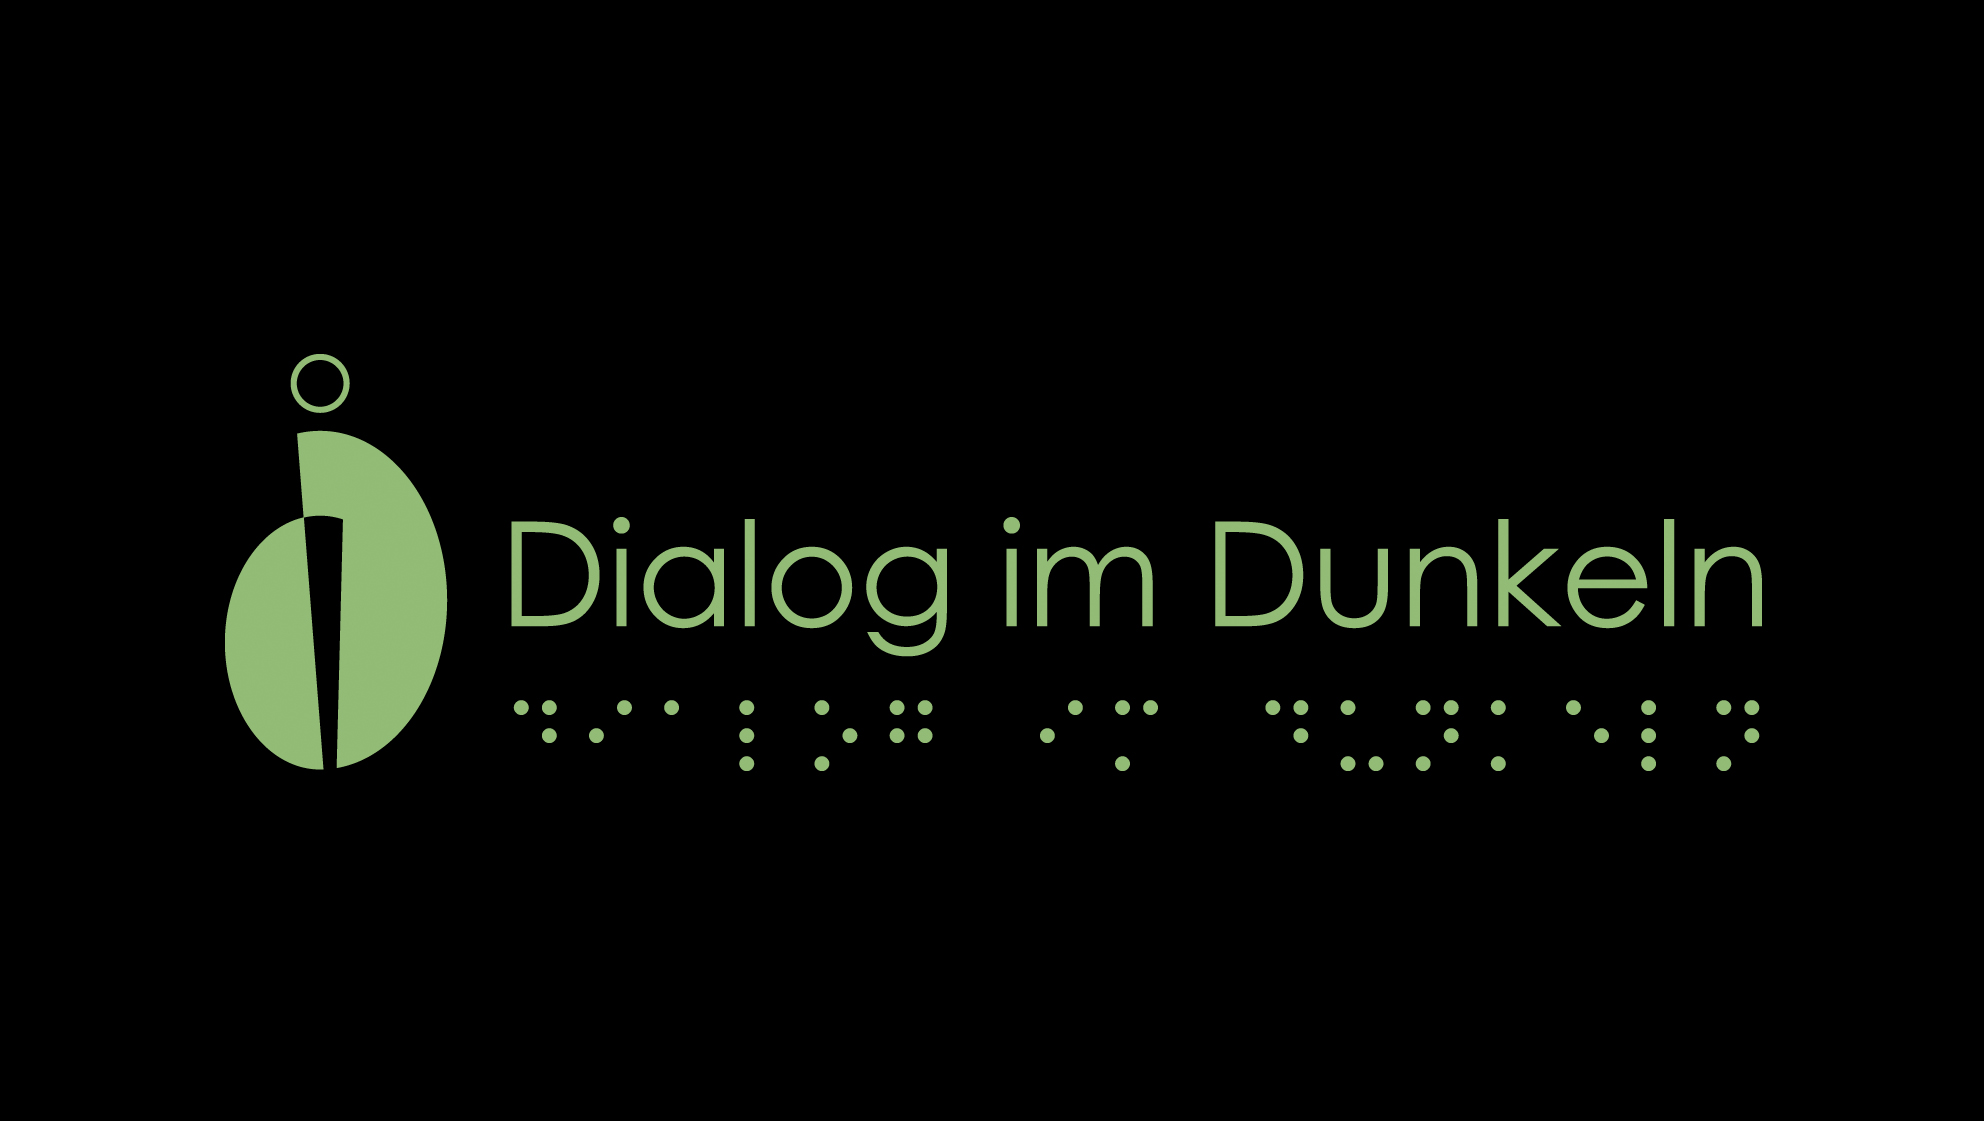 Dialog im Dunkeln